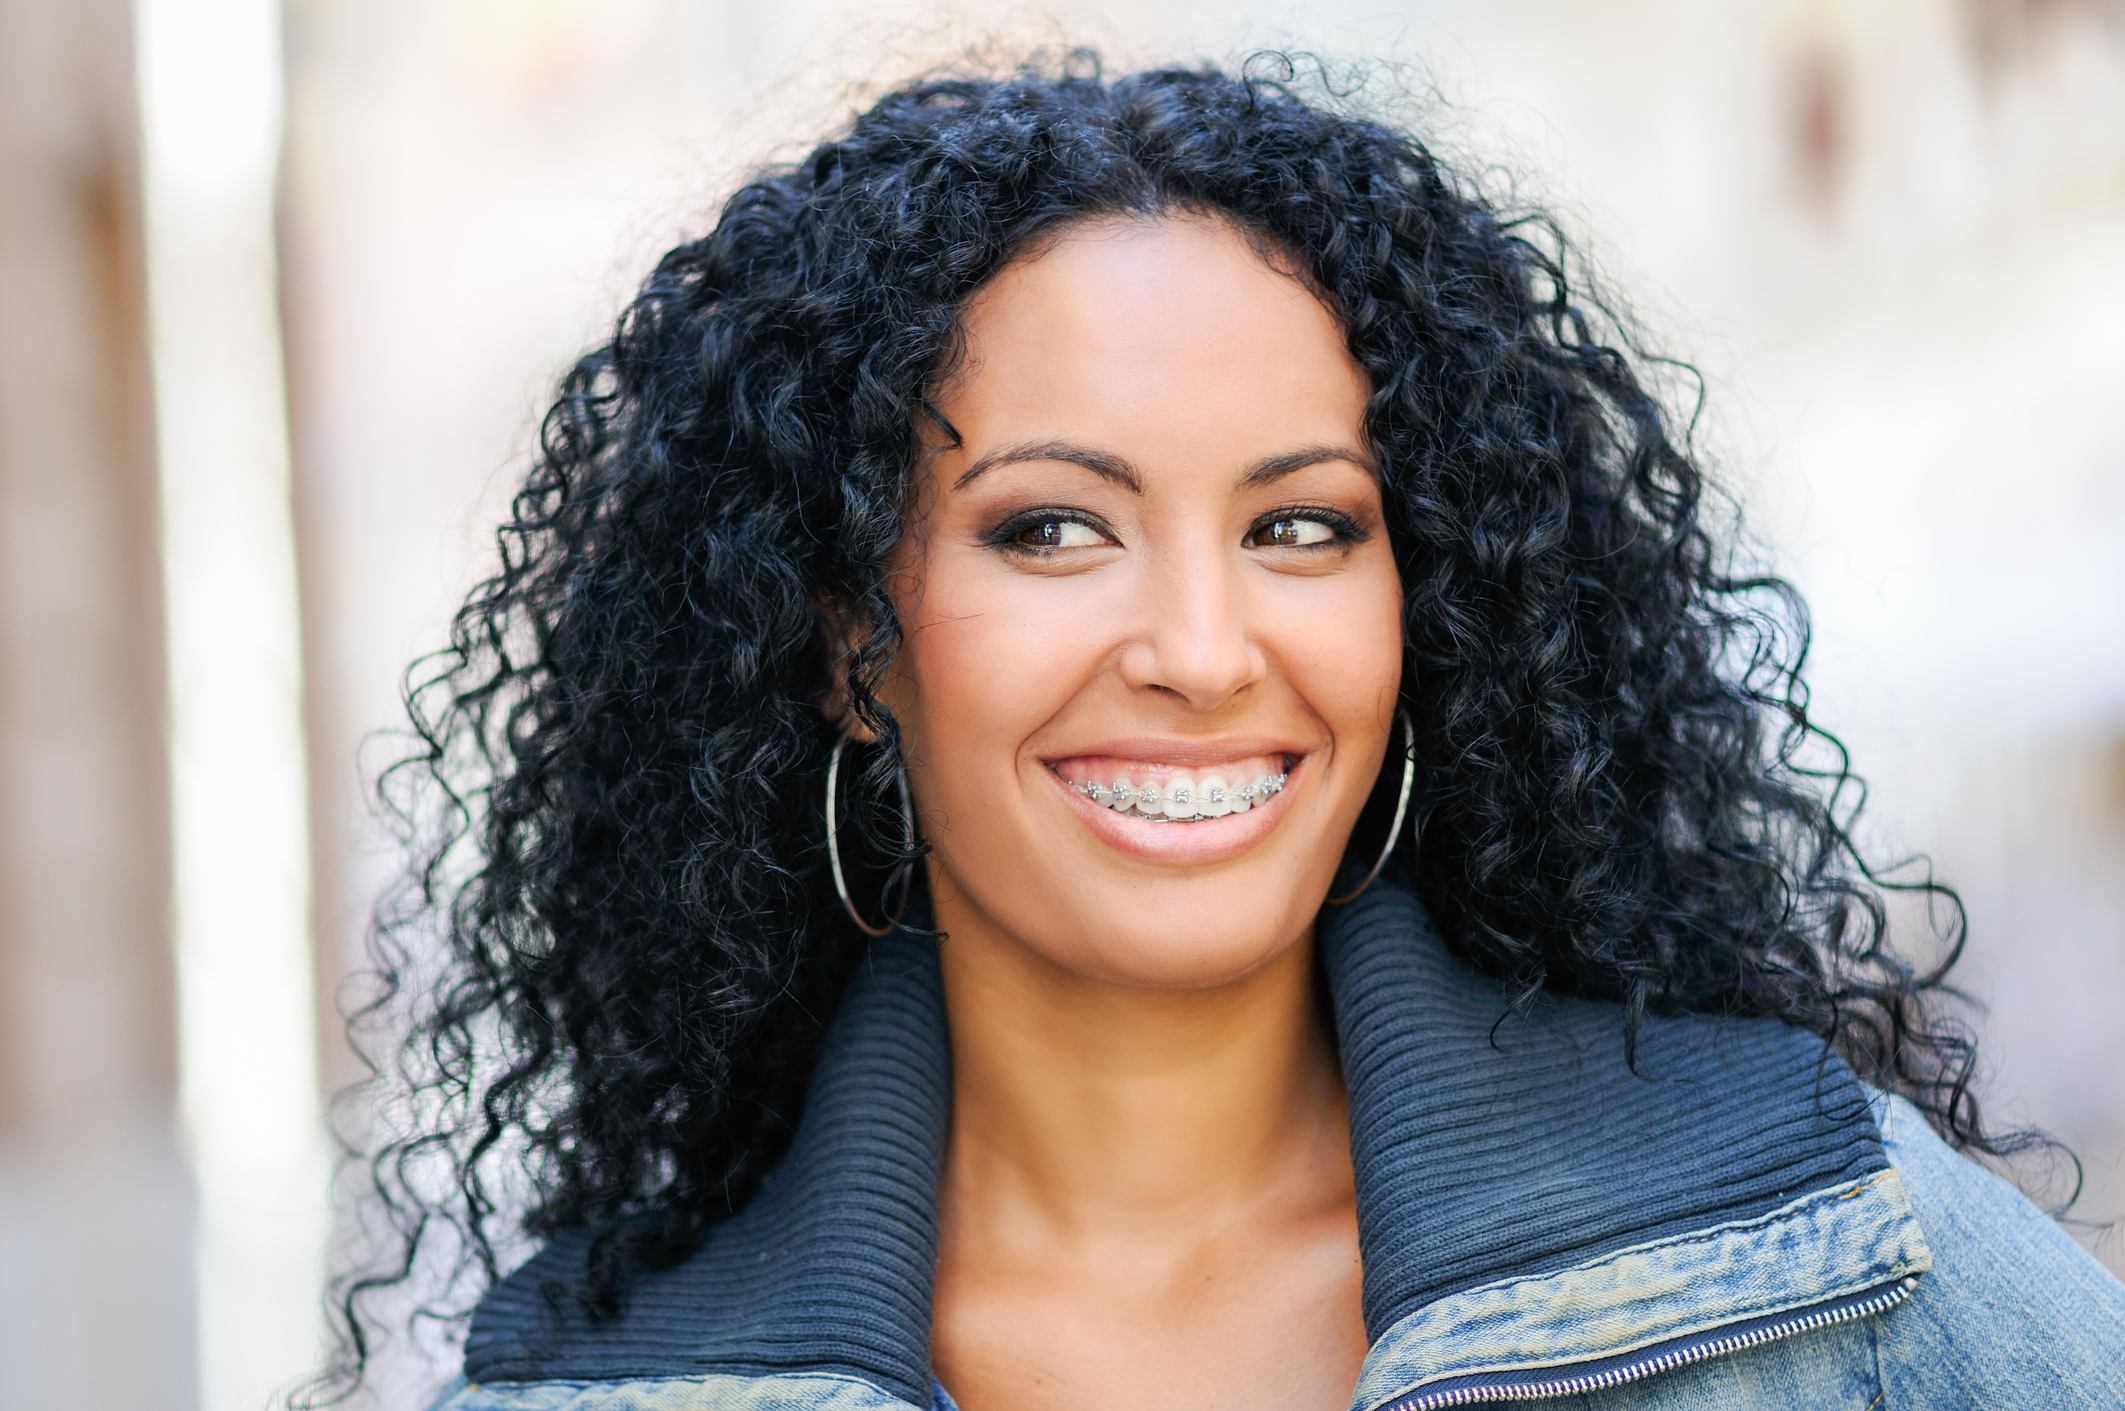 Como matizar o cabelo preto e evitar o desbotamento?